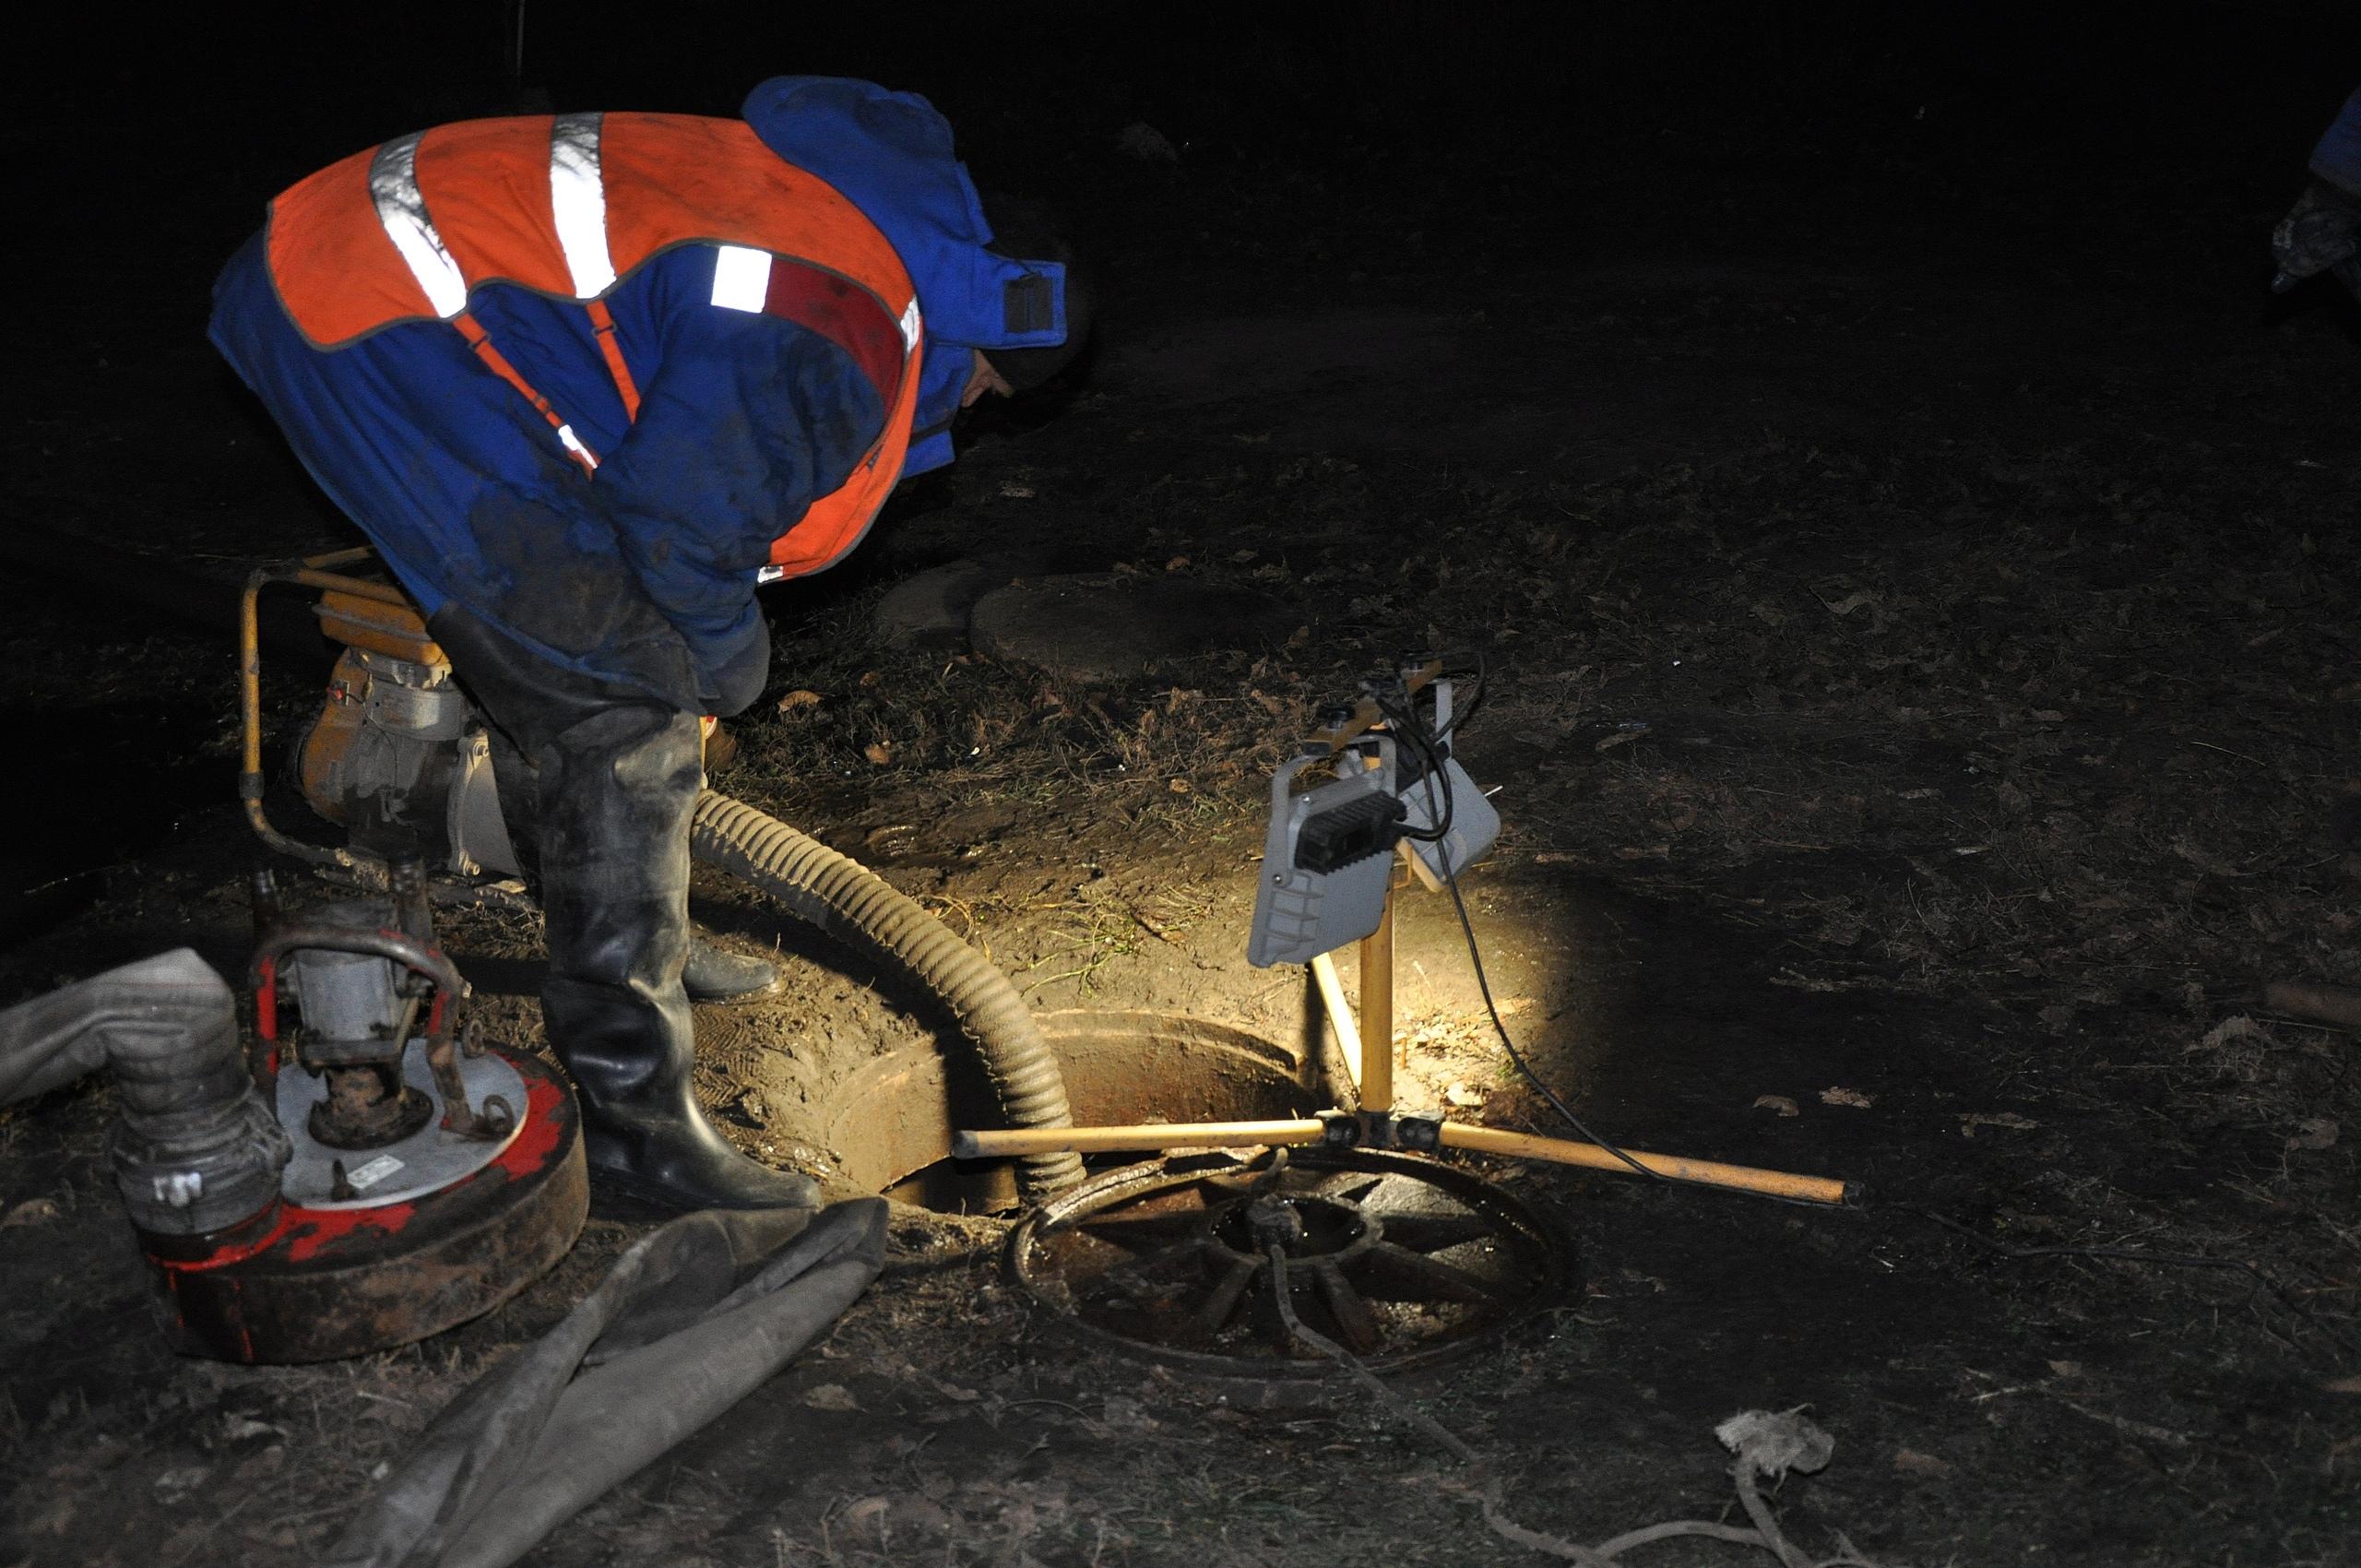 В Тамбове на МЖК и в Пехотке снизят напор воды из-за очередного порыва